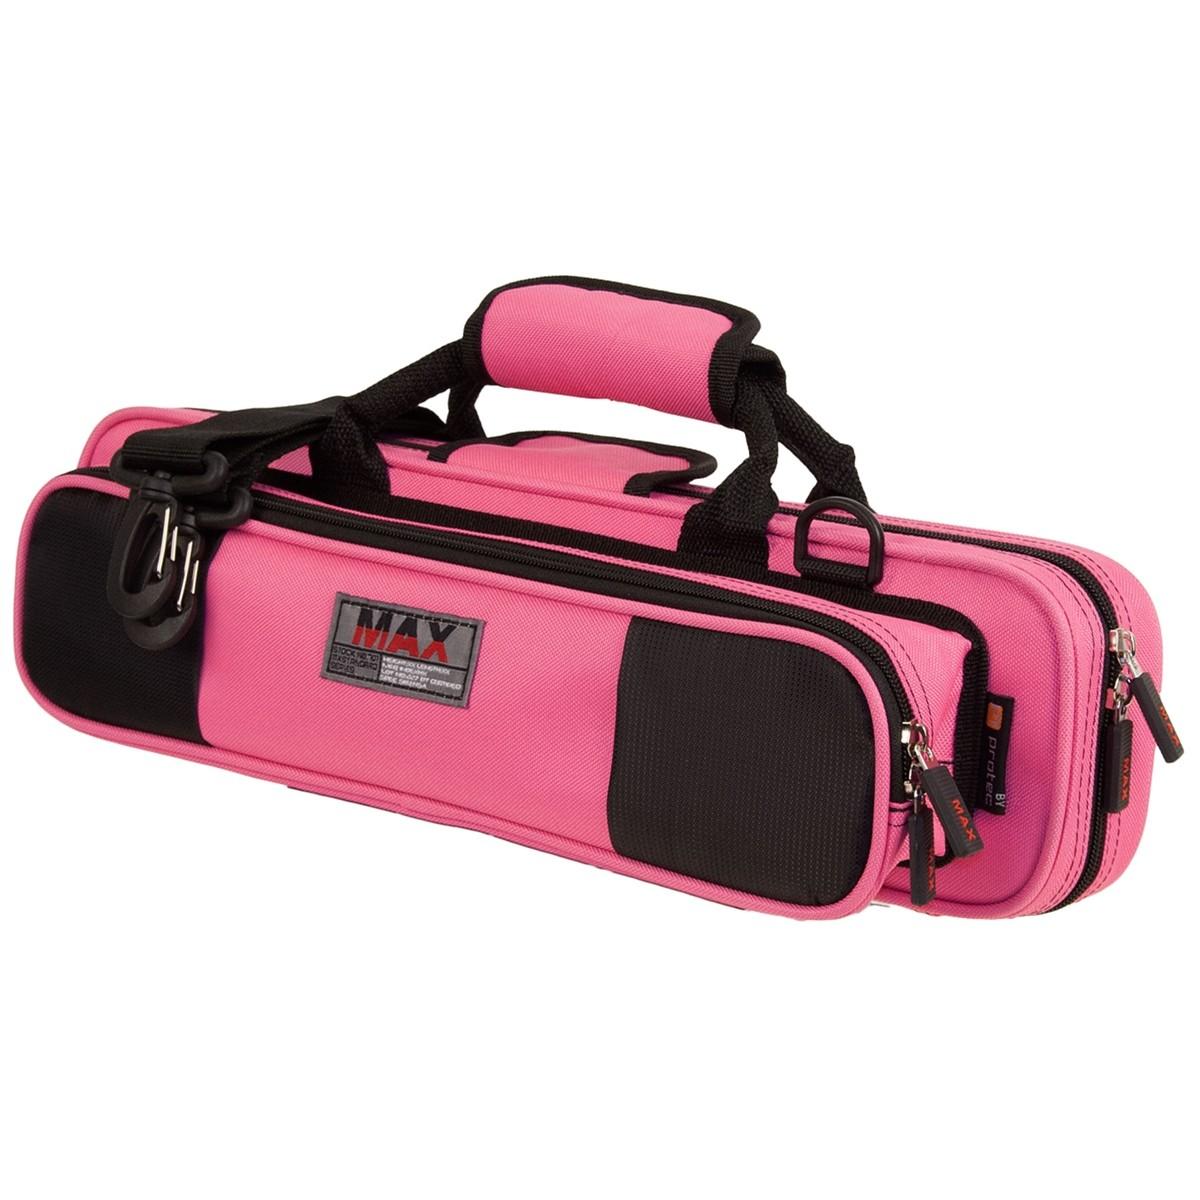 Protec Flute MAX Case (Fuchsia/Pink MX308FX)